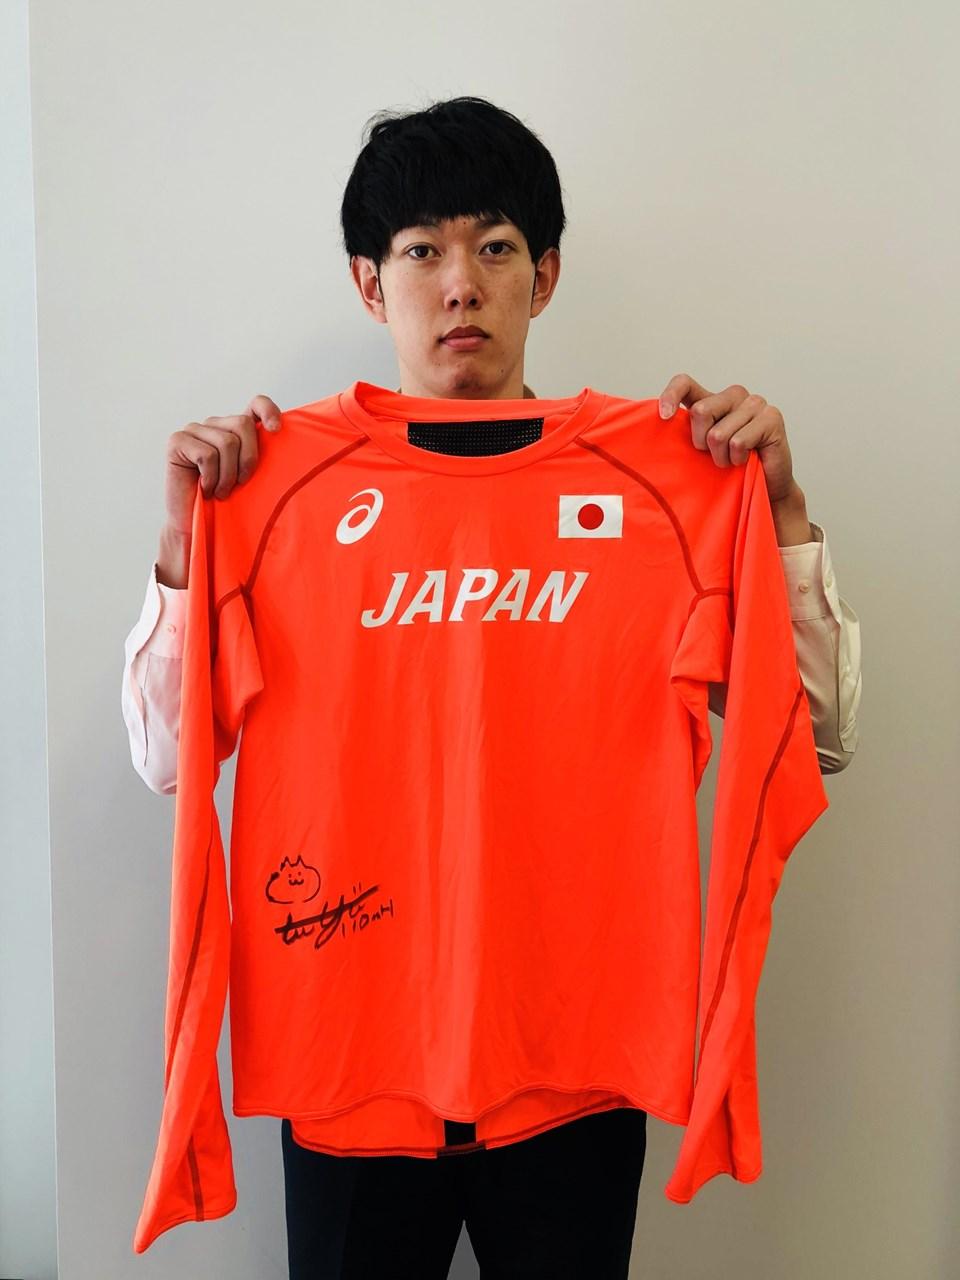 【日本陸連公式】高山 峻野 選手(ロンT)